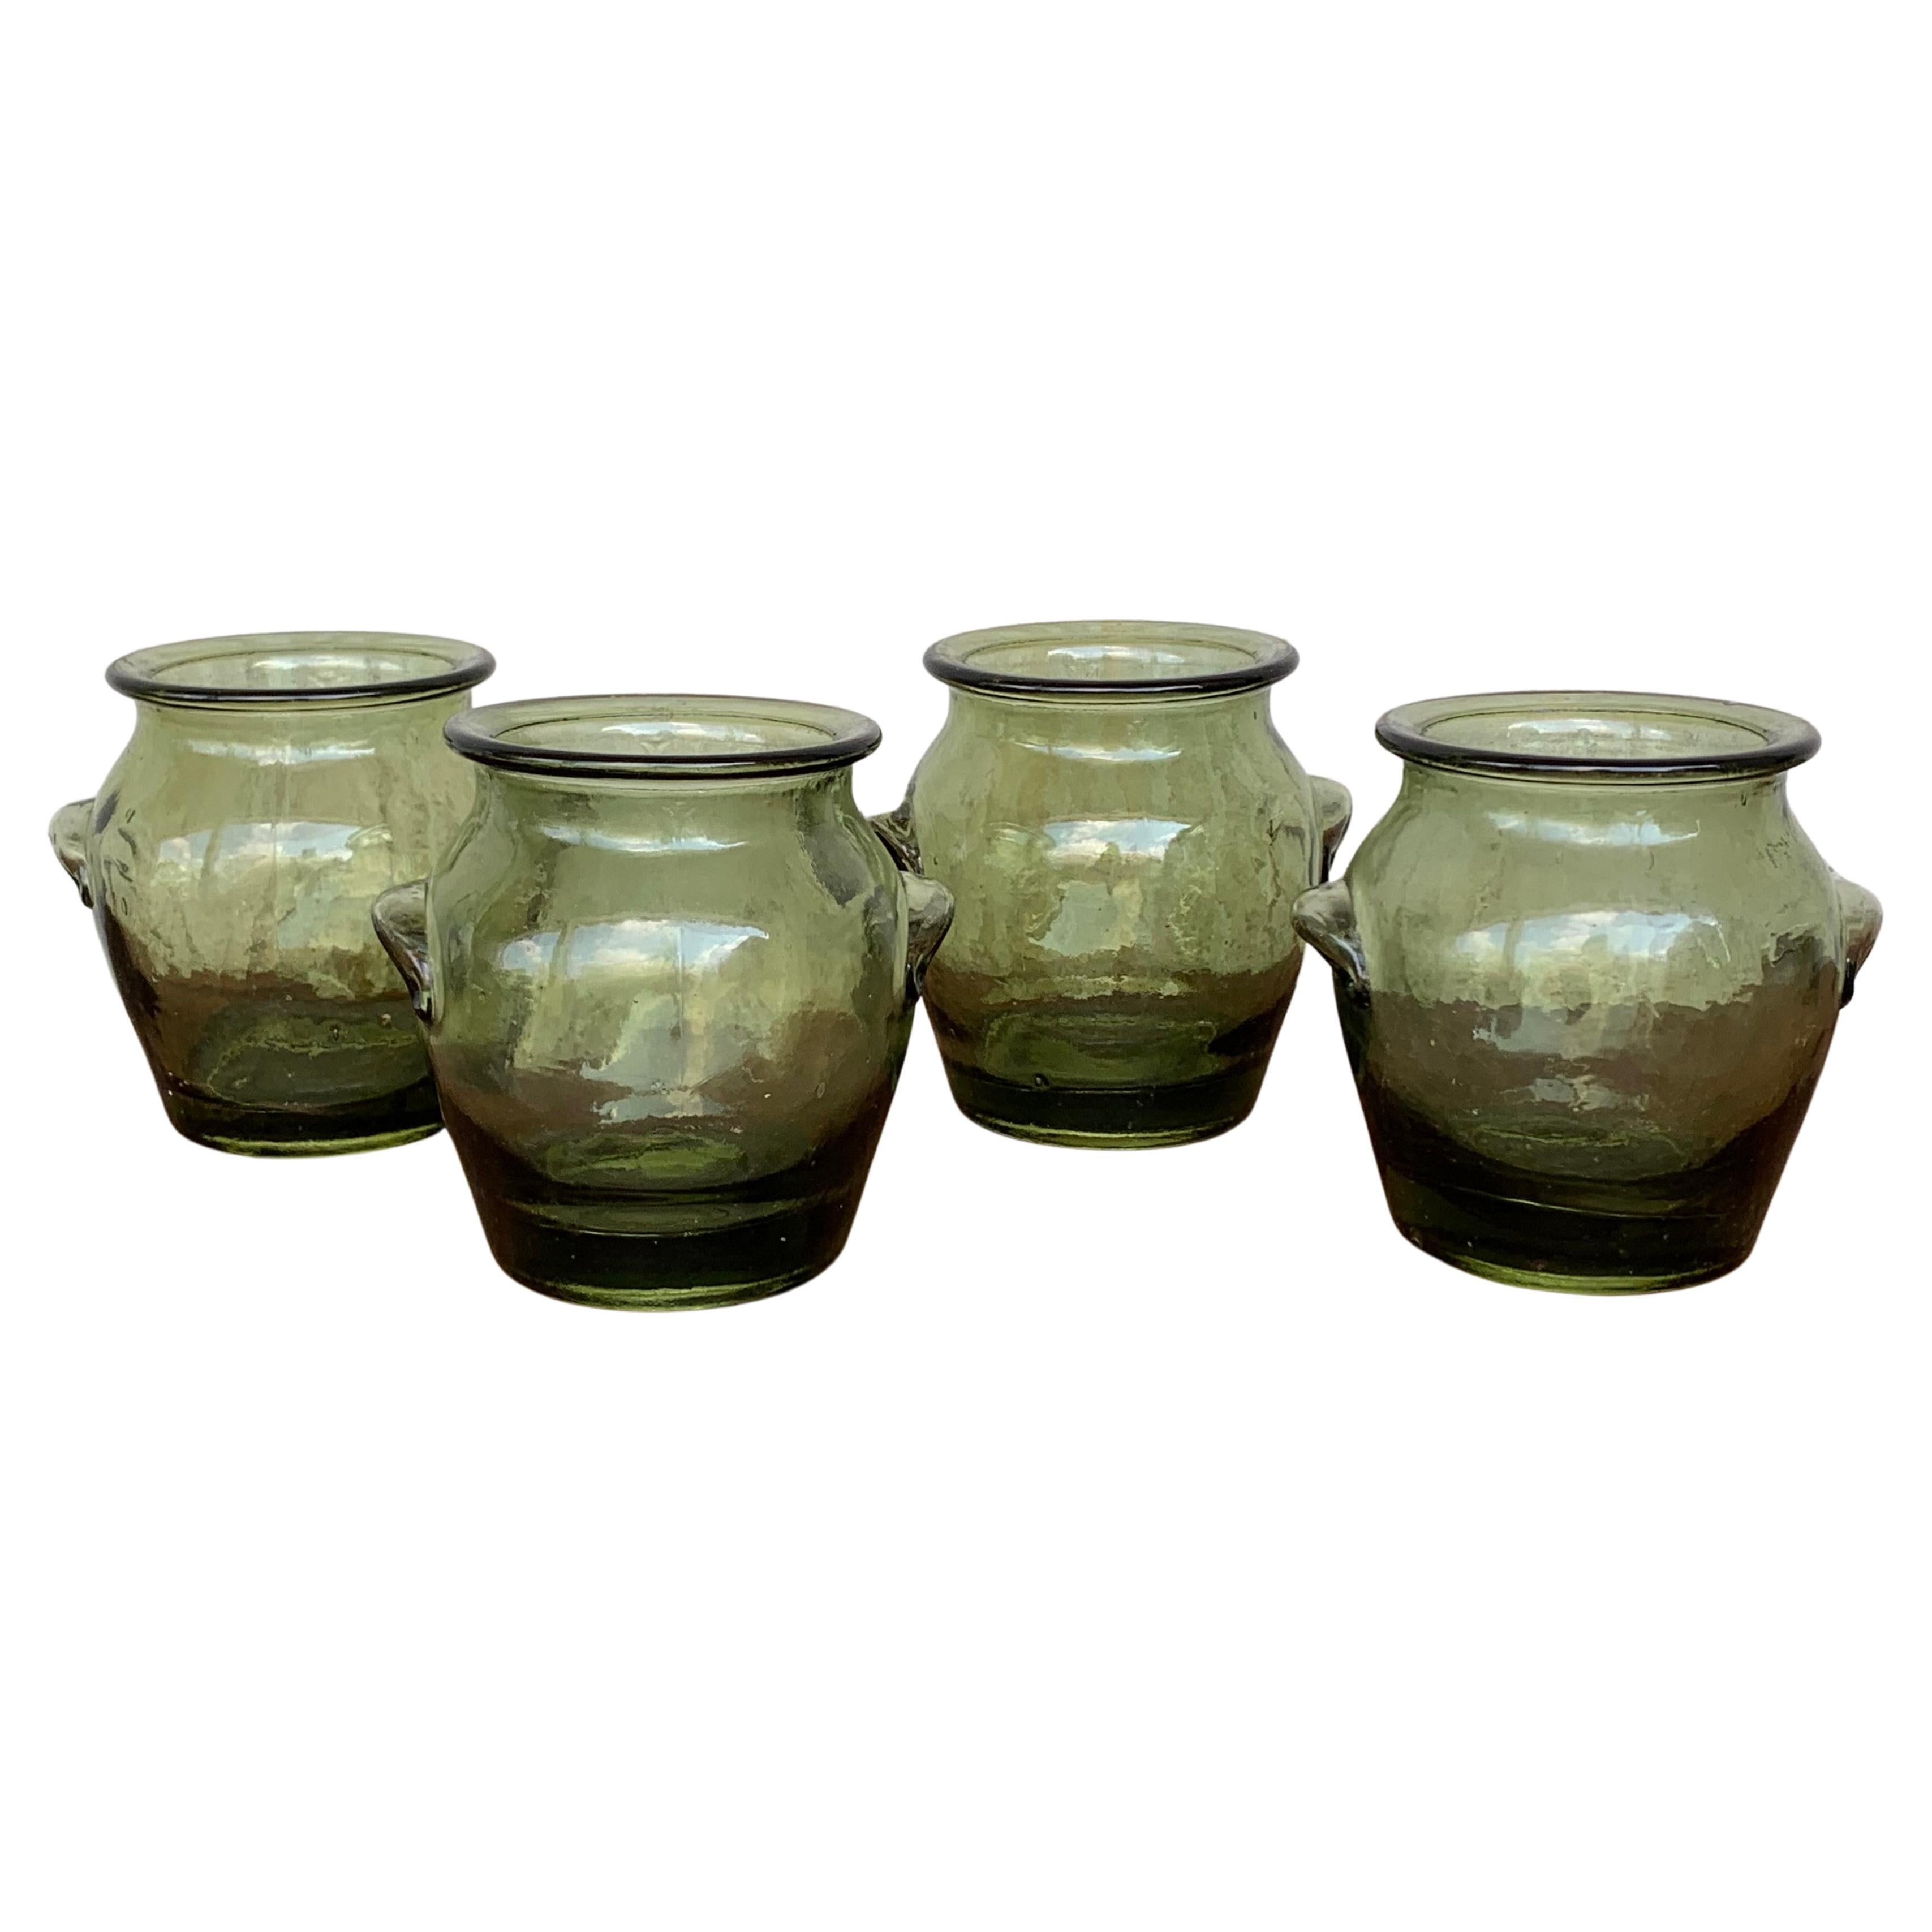 Vintage Green Glass Canister Storage Jars, Spain Flour, Tea, 1960s